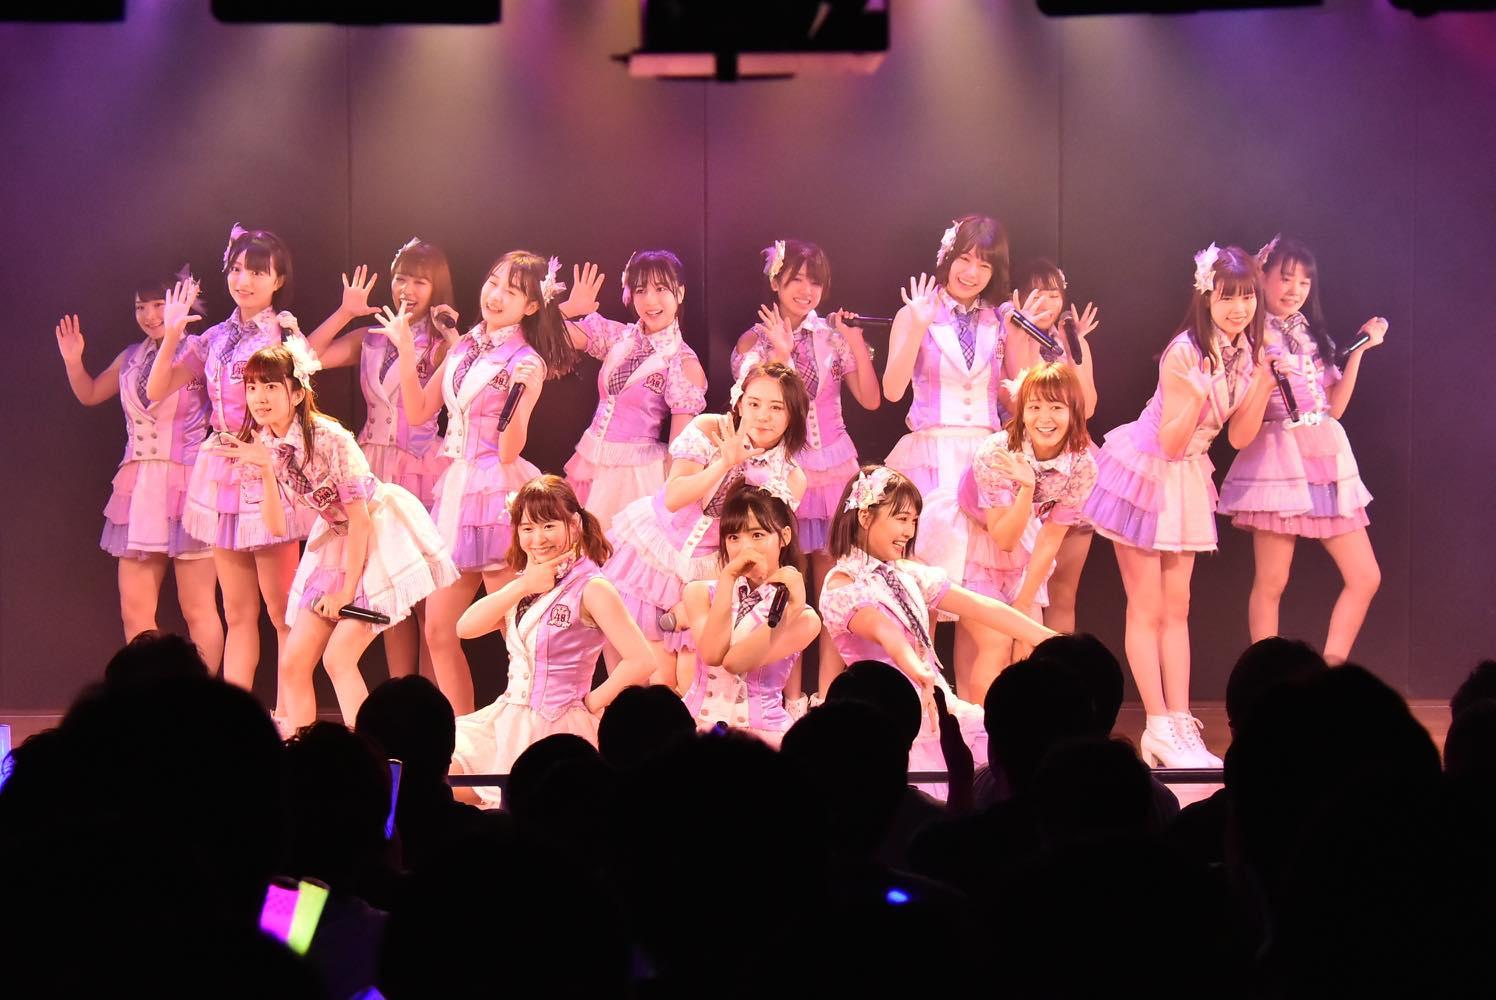 AKB48チーム8が新曲『好きだ 好きだ 好きだ』を初披露、全国ツアーの⽇程も発表【写真6枚】の画像005